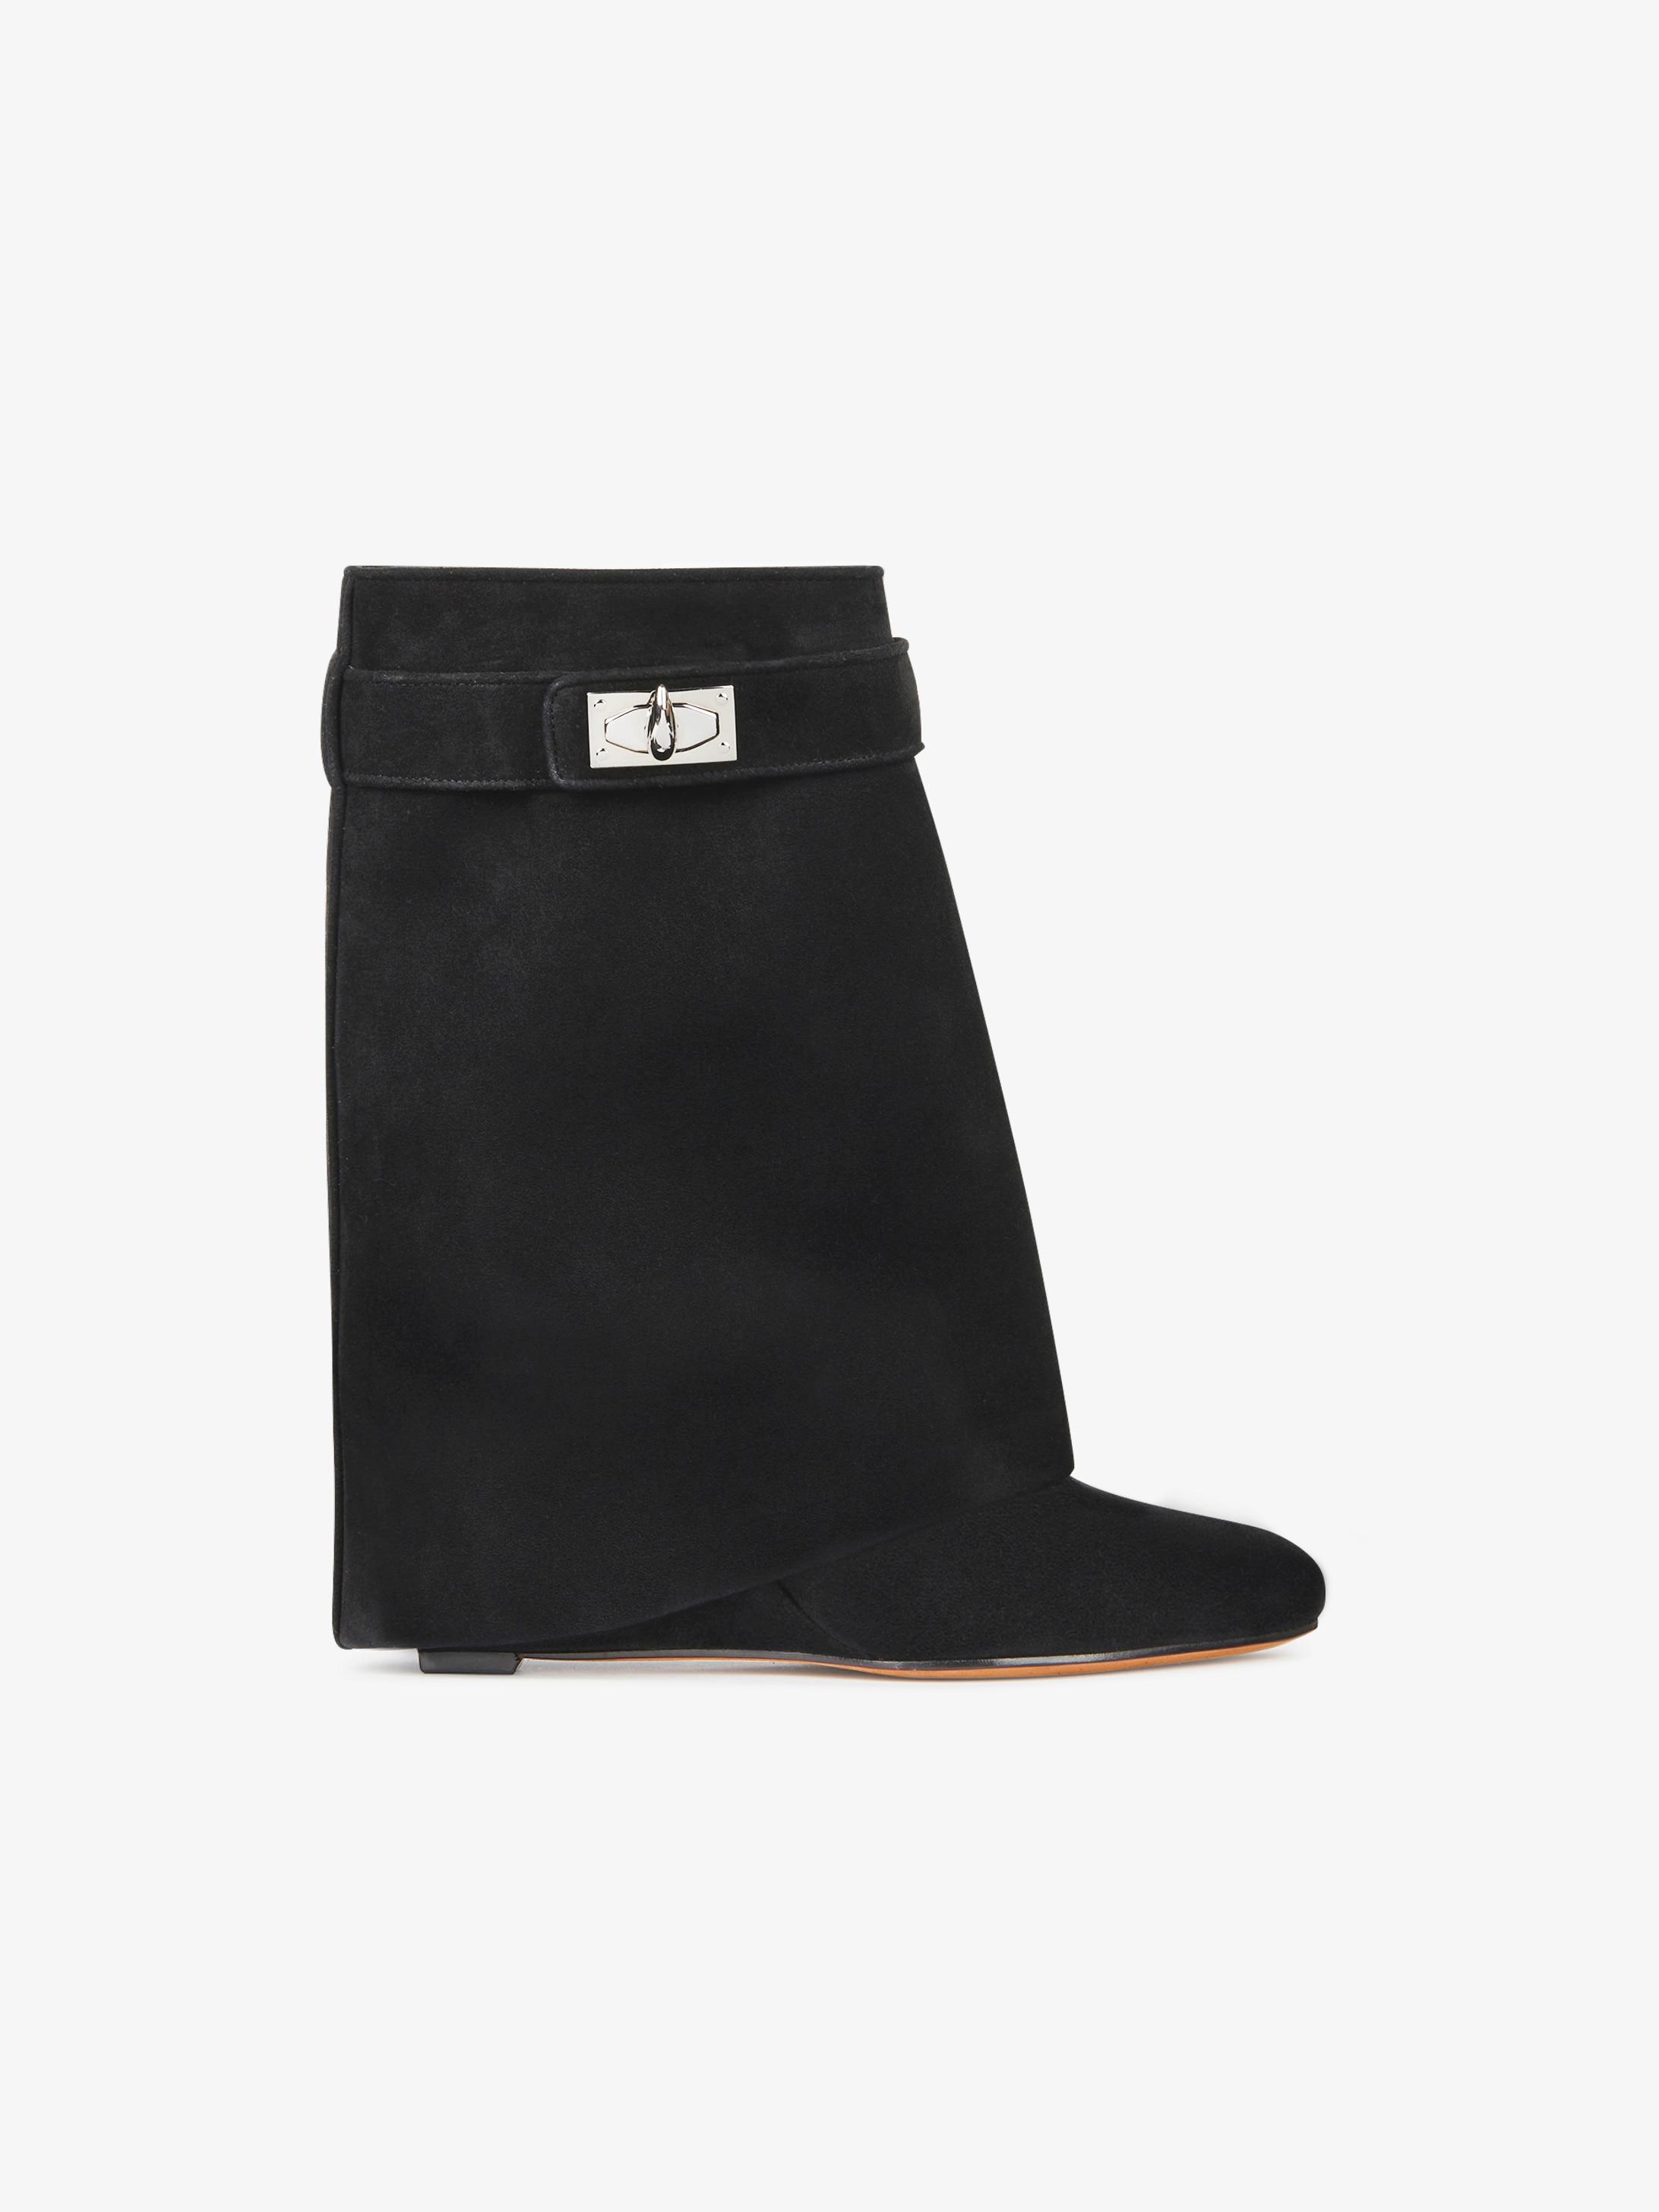 Shark Lock boots in suede